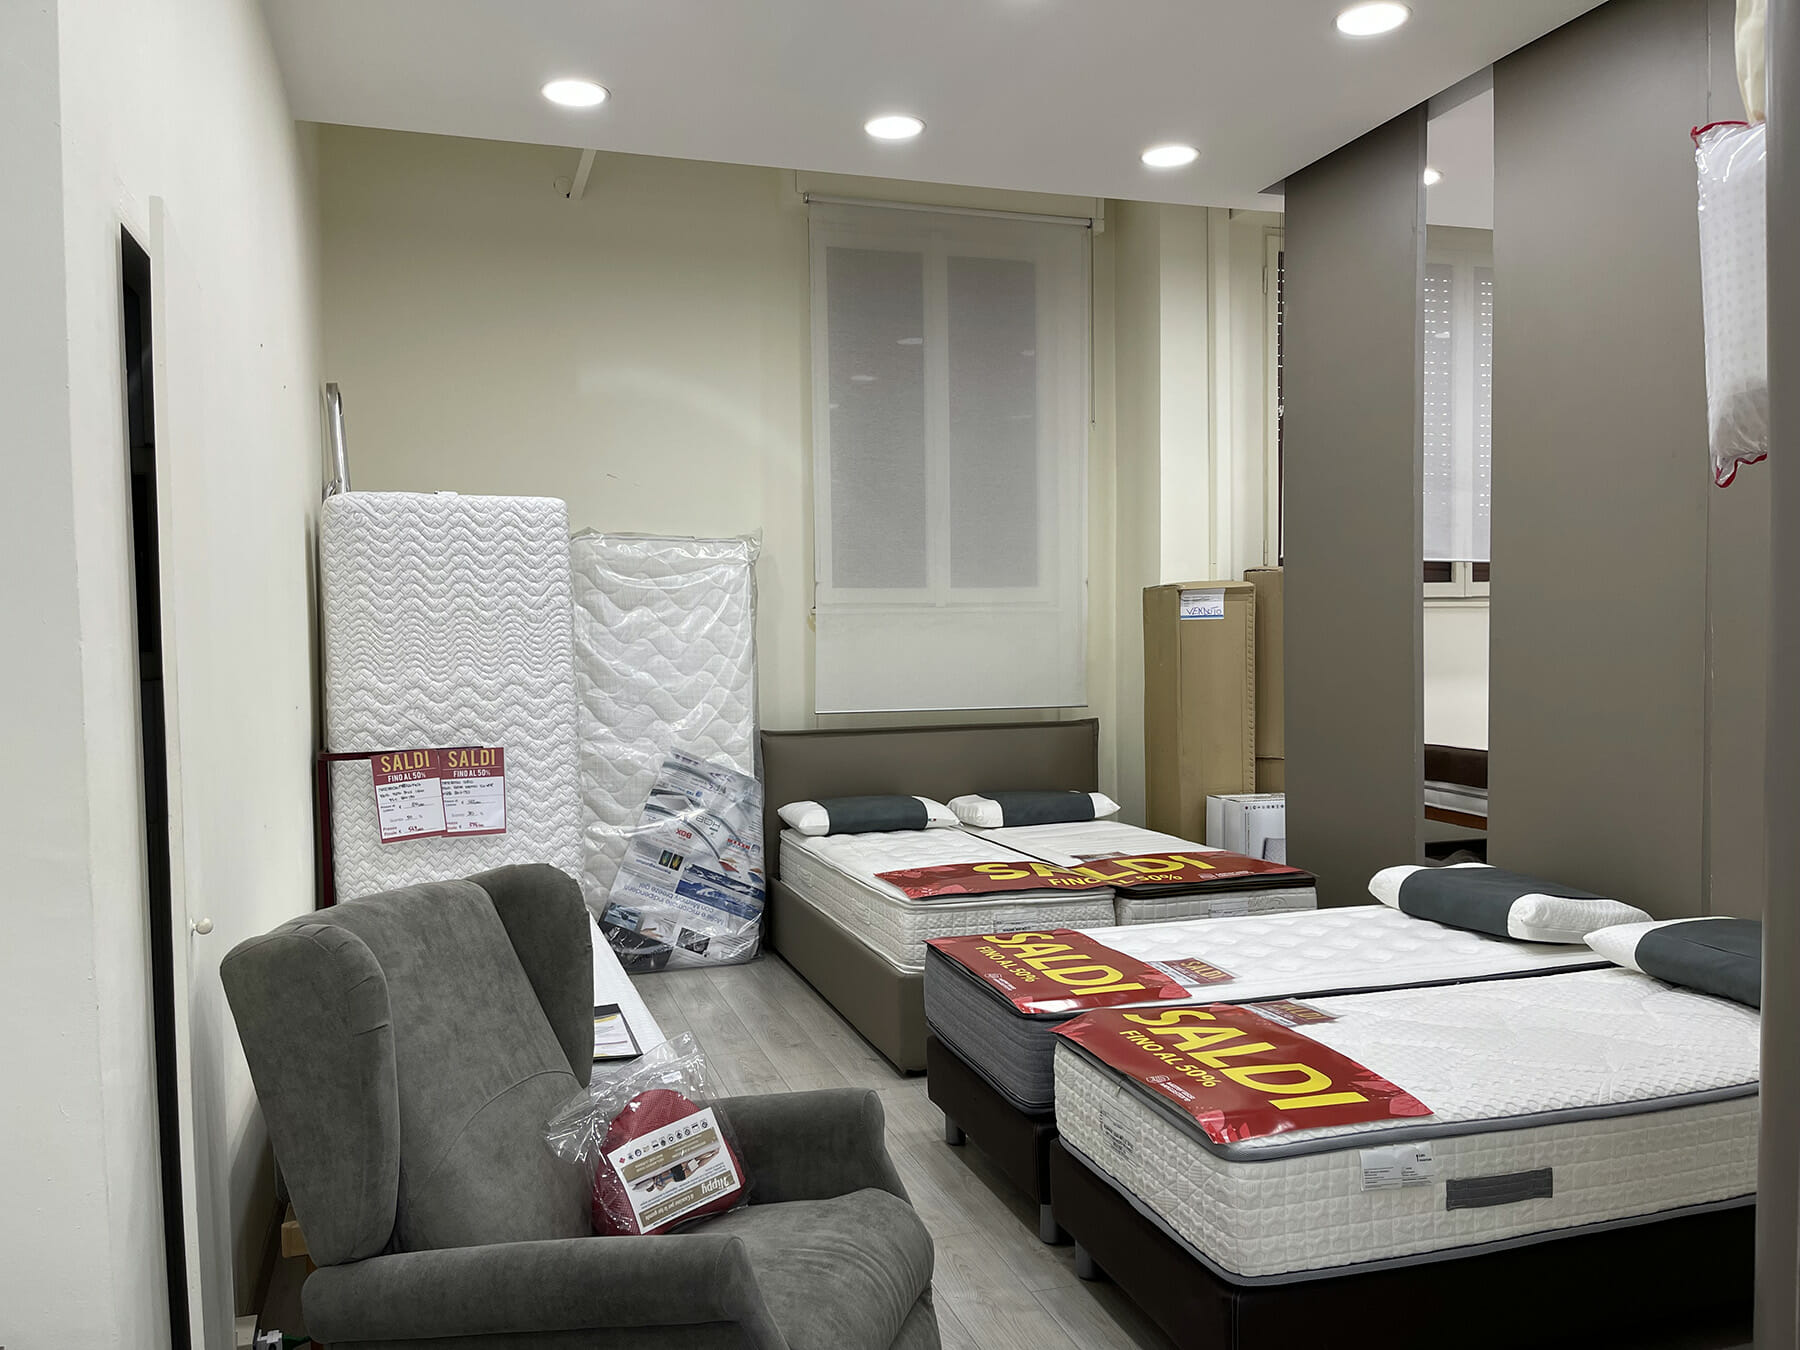 Materassimegastore Punto vendita Milano Lorenteggio 4